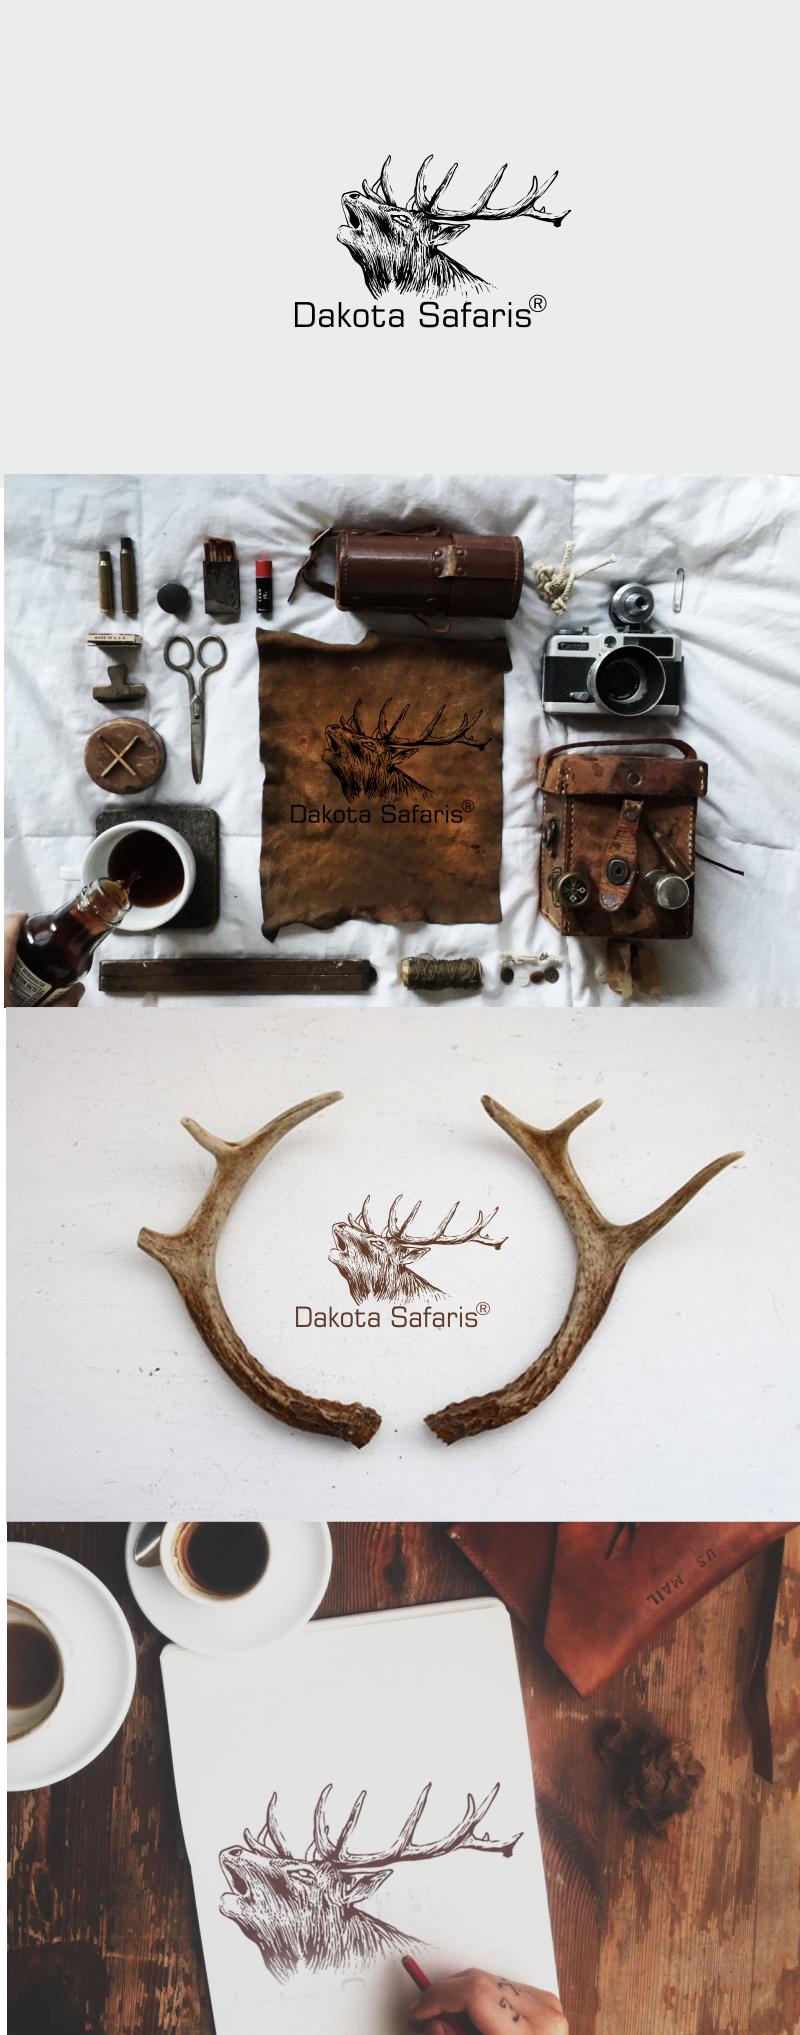 Dakota Safaris (туризм, сафари)